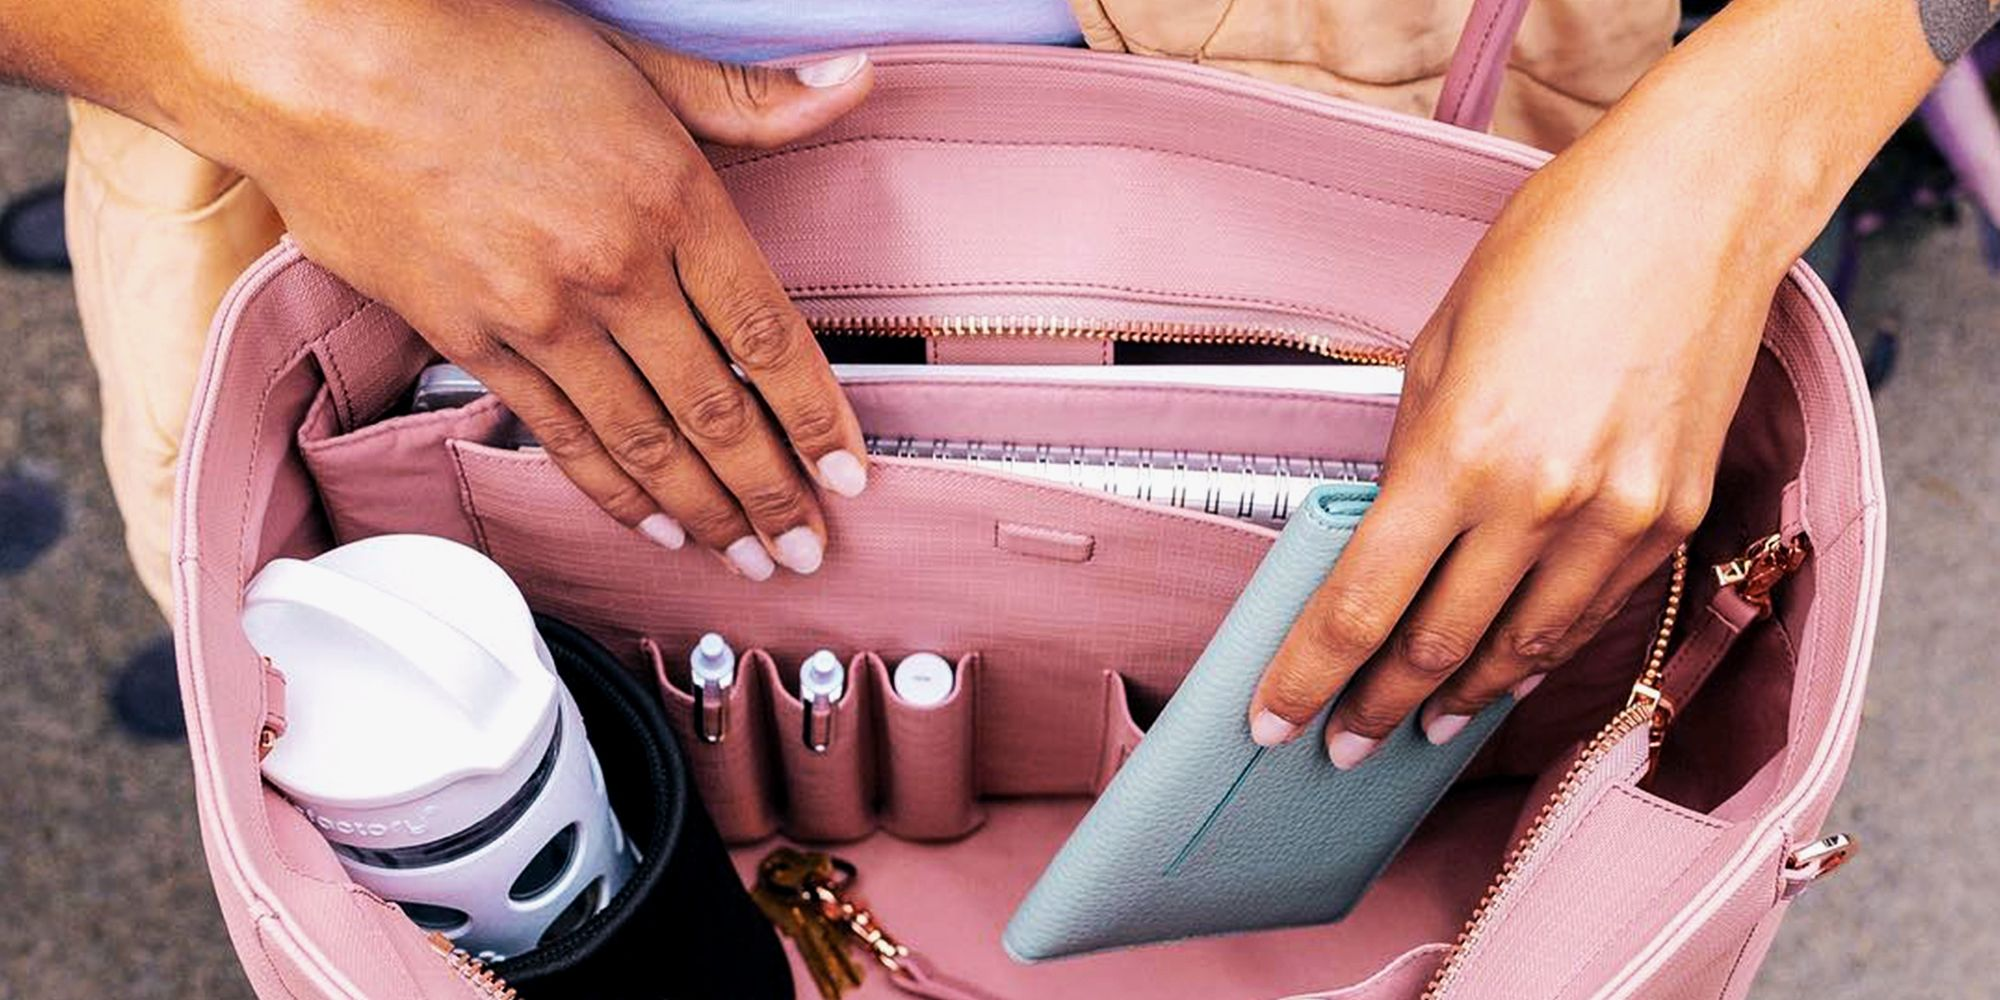 10 Best Laptop Bags for Women in 2019 - Designer Laptop Backpacks & Bags